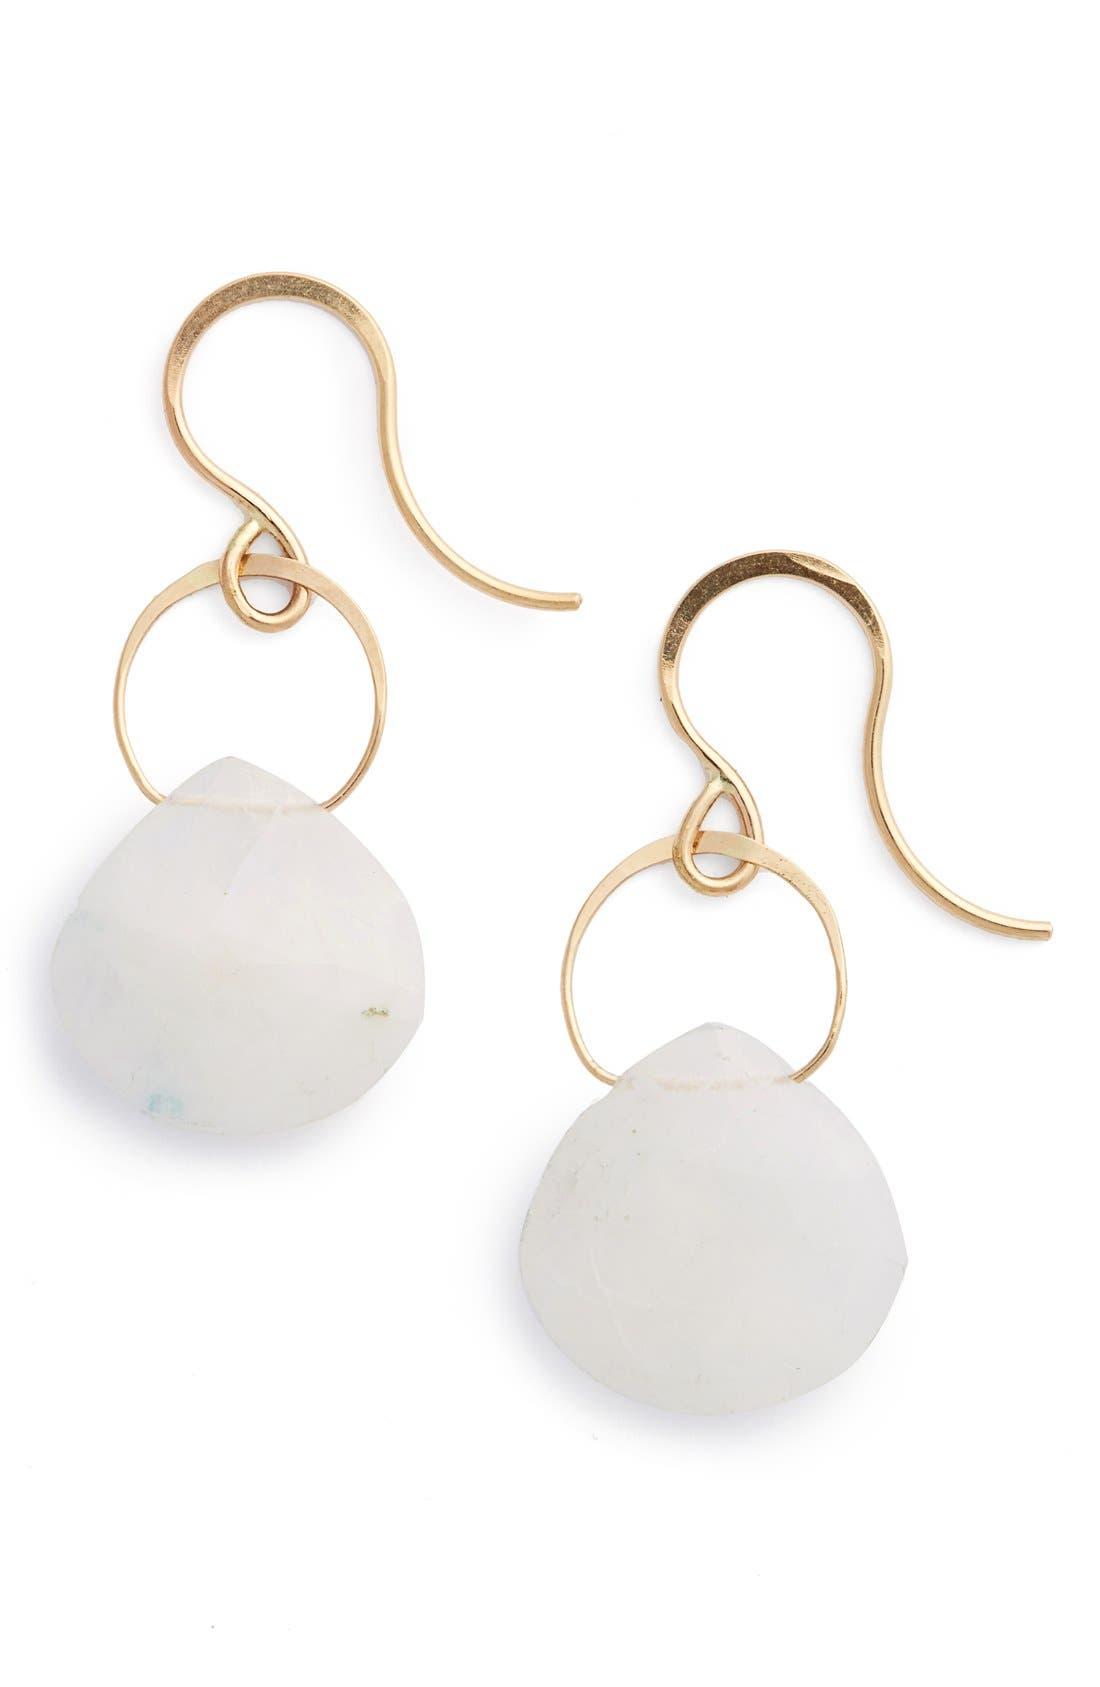 Semiprecious Stone Drop Earrings,                             Main thumbnail 1, color,                             LABRADORITE/ YELLOW GOLD